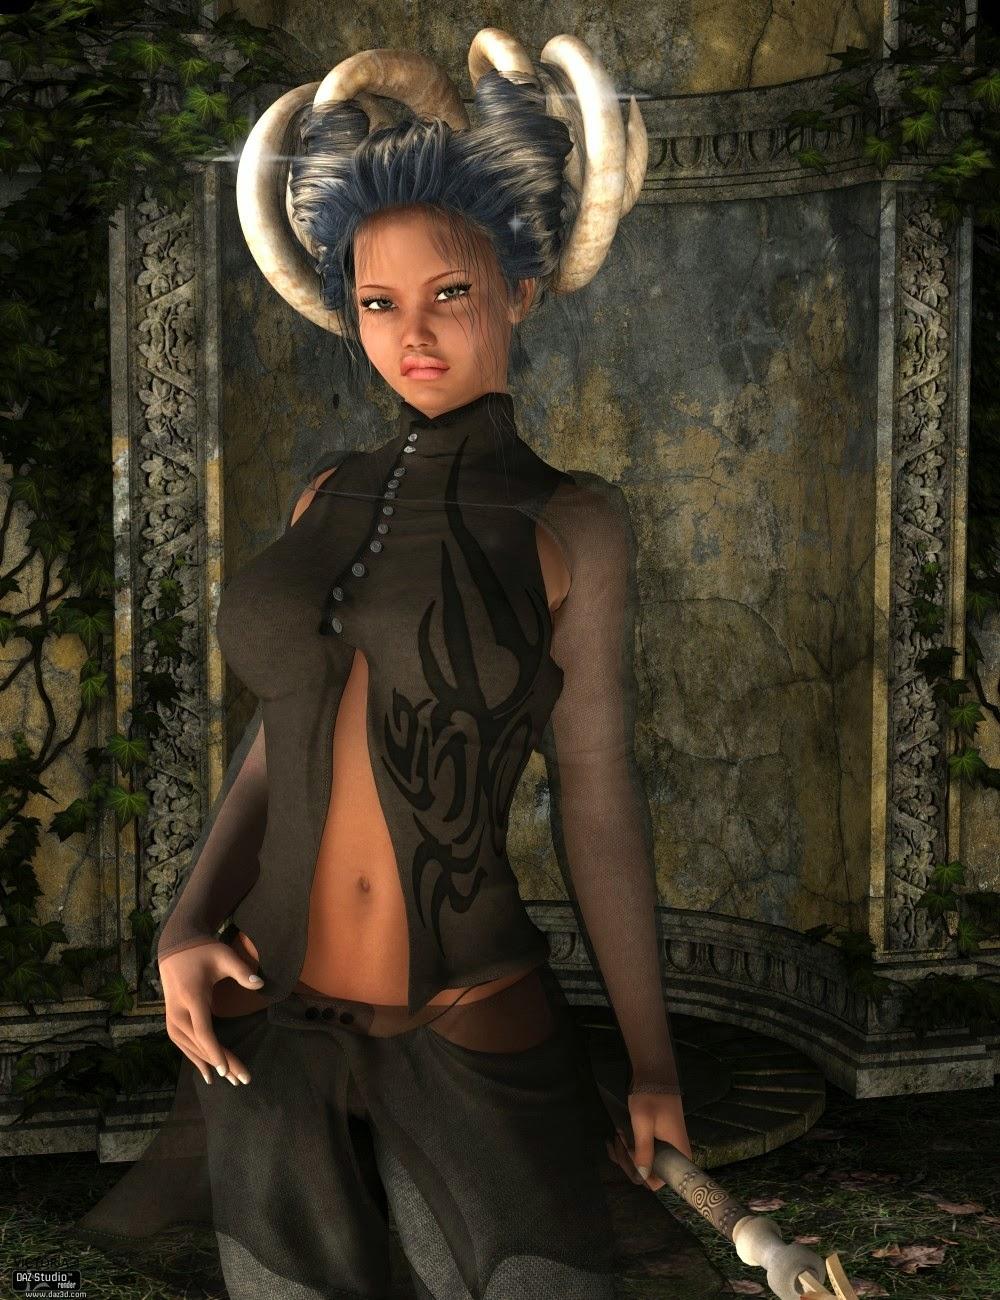 LY Mikaella